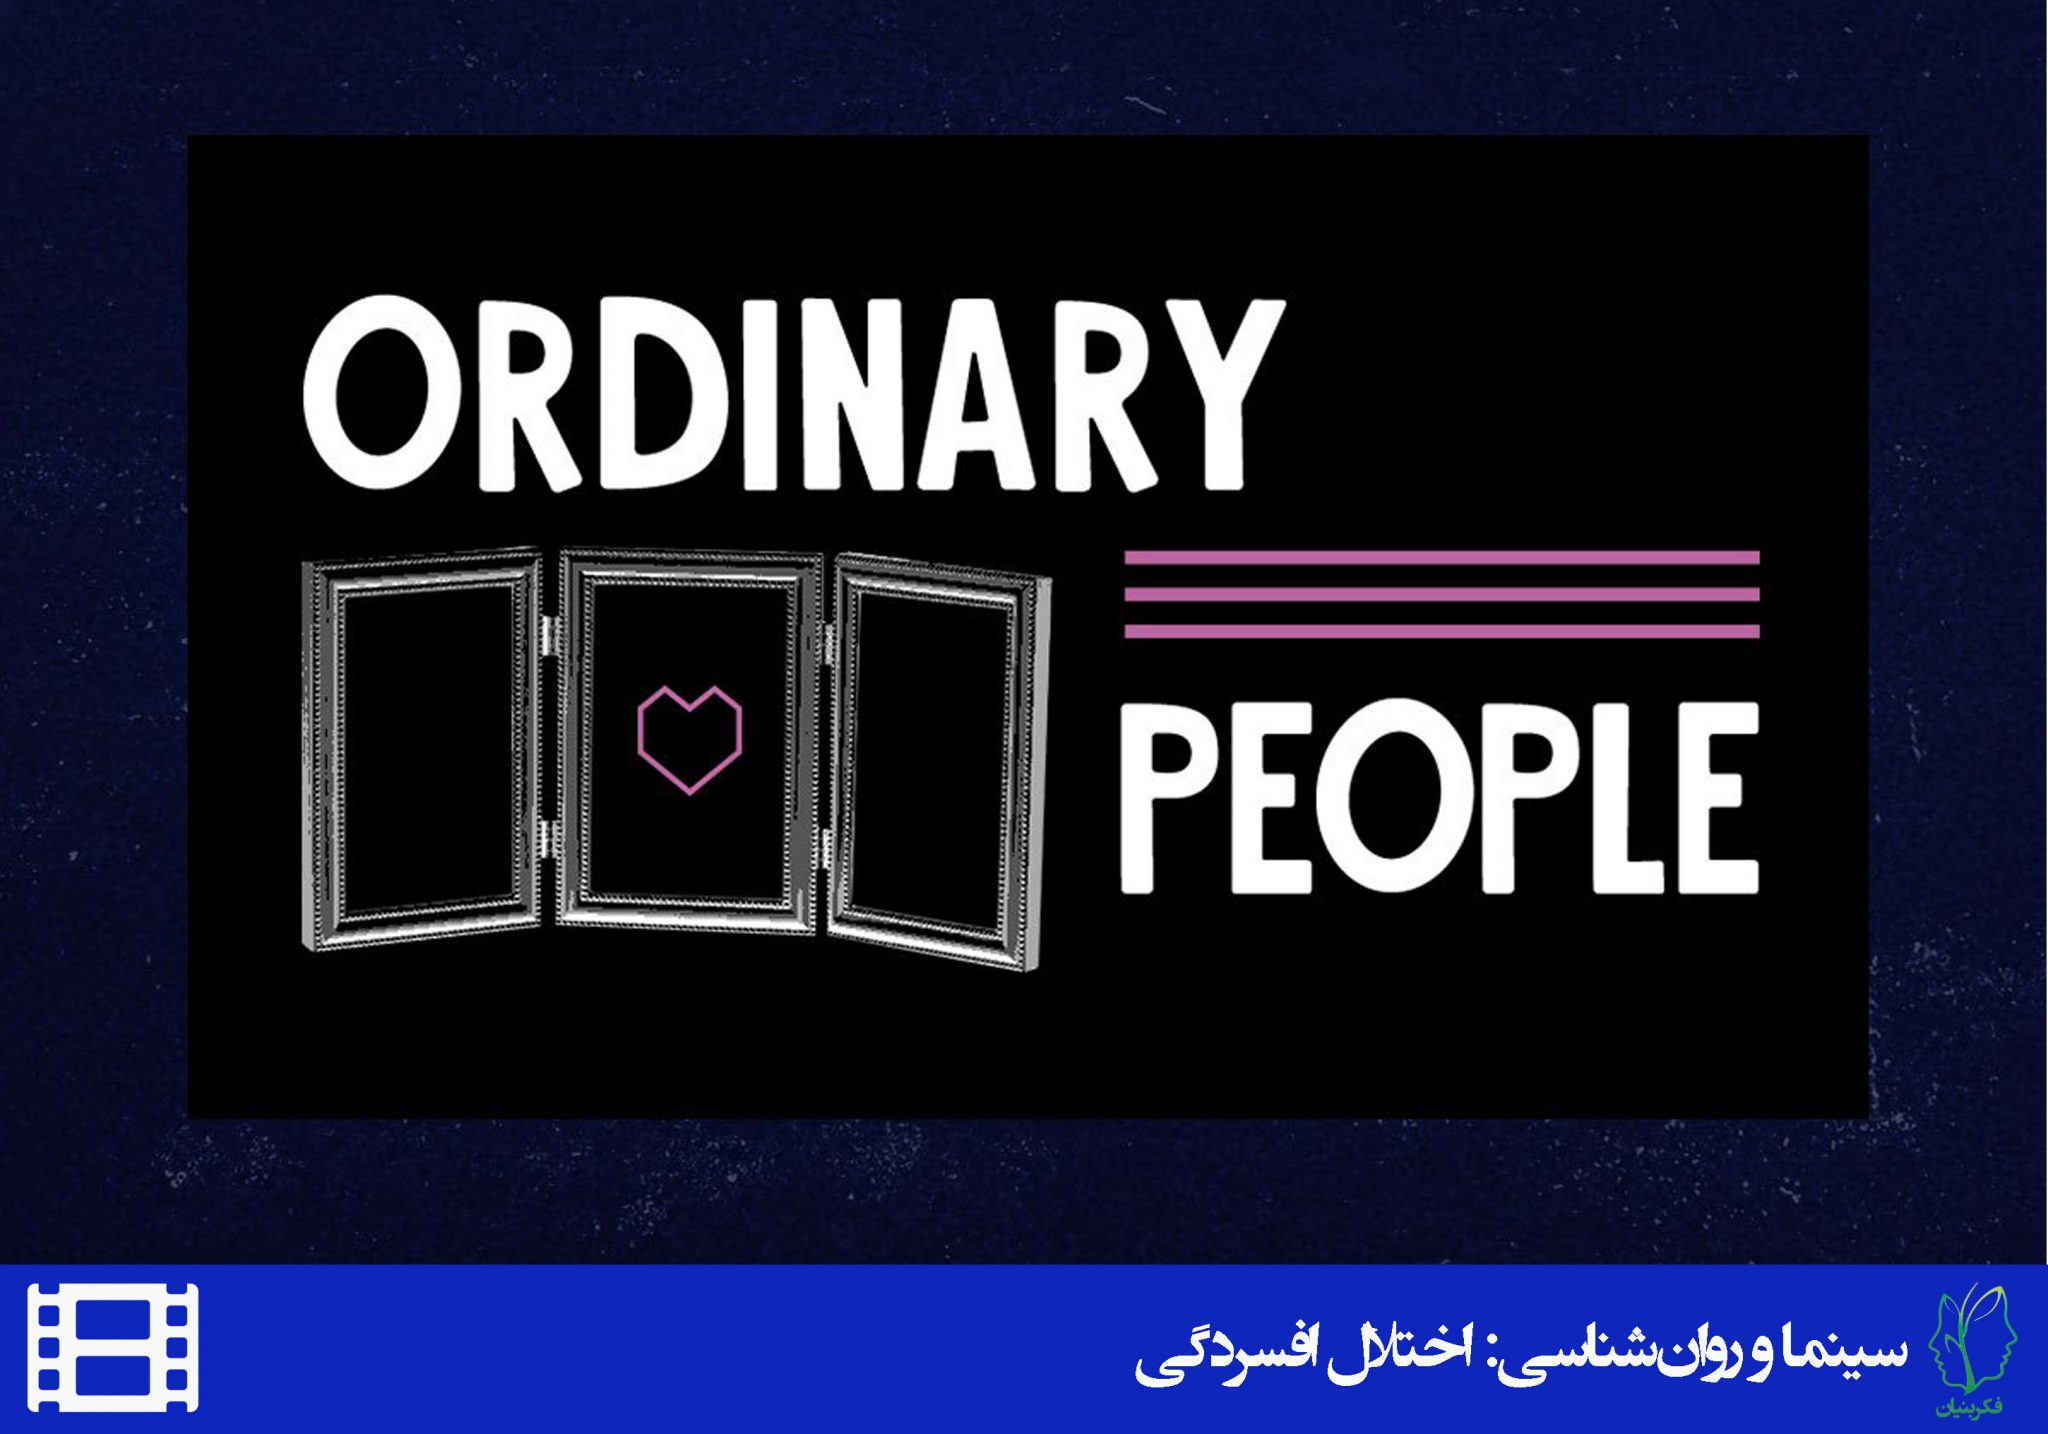 فیلم مردم عادی (Ordinary People)